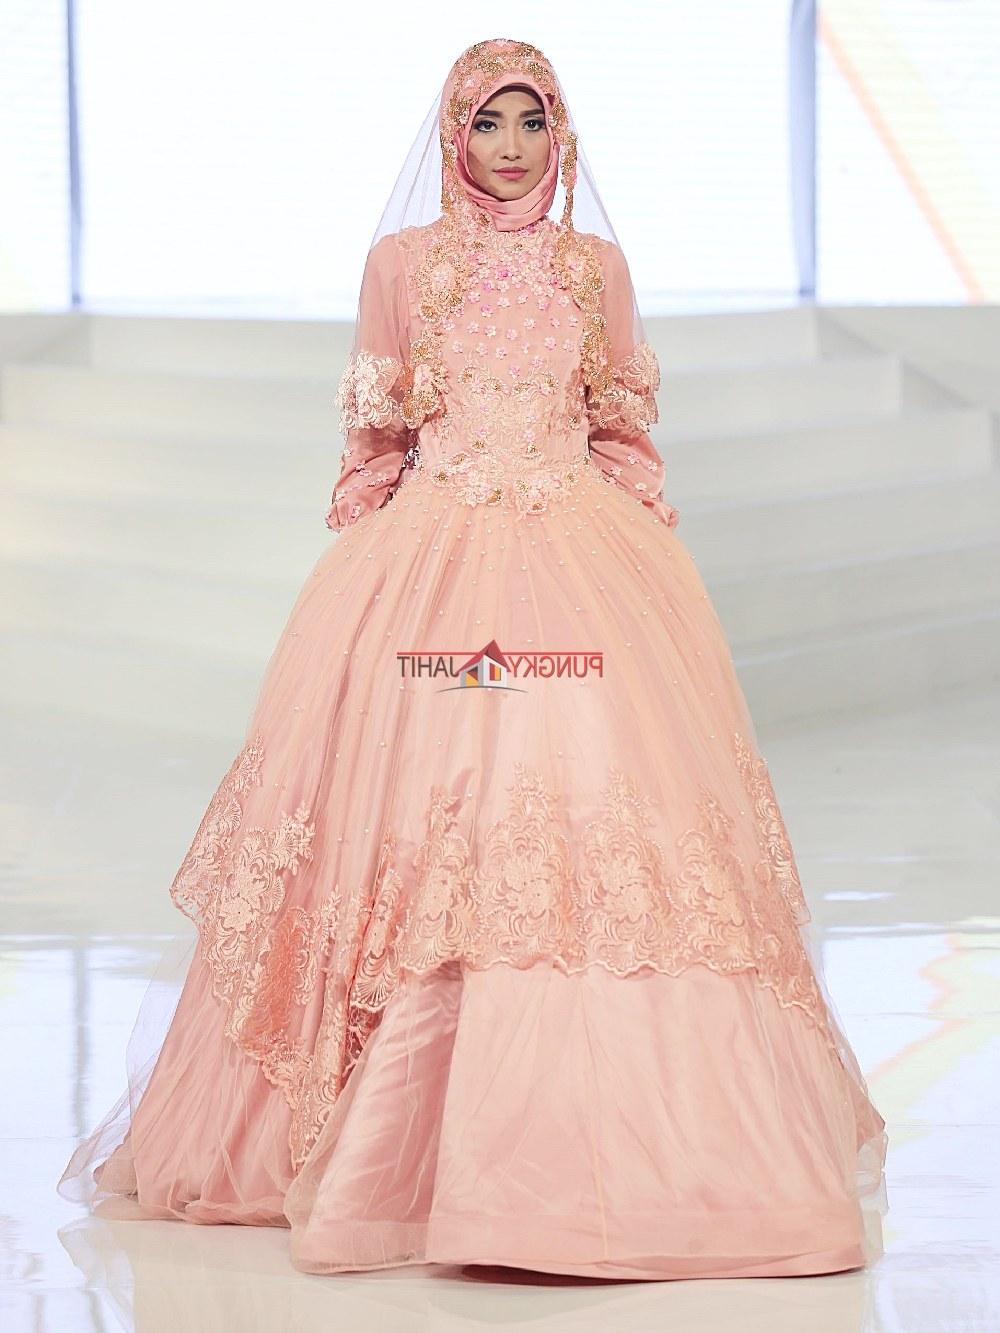 Bentuk Sewa Gaun Pengantin Muslimah Di Bekasi E9dx Gaun Pengantin Muslimah Dress Muslim Pungky Rumah Jahit